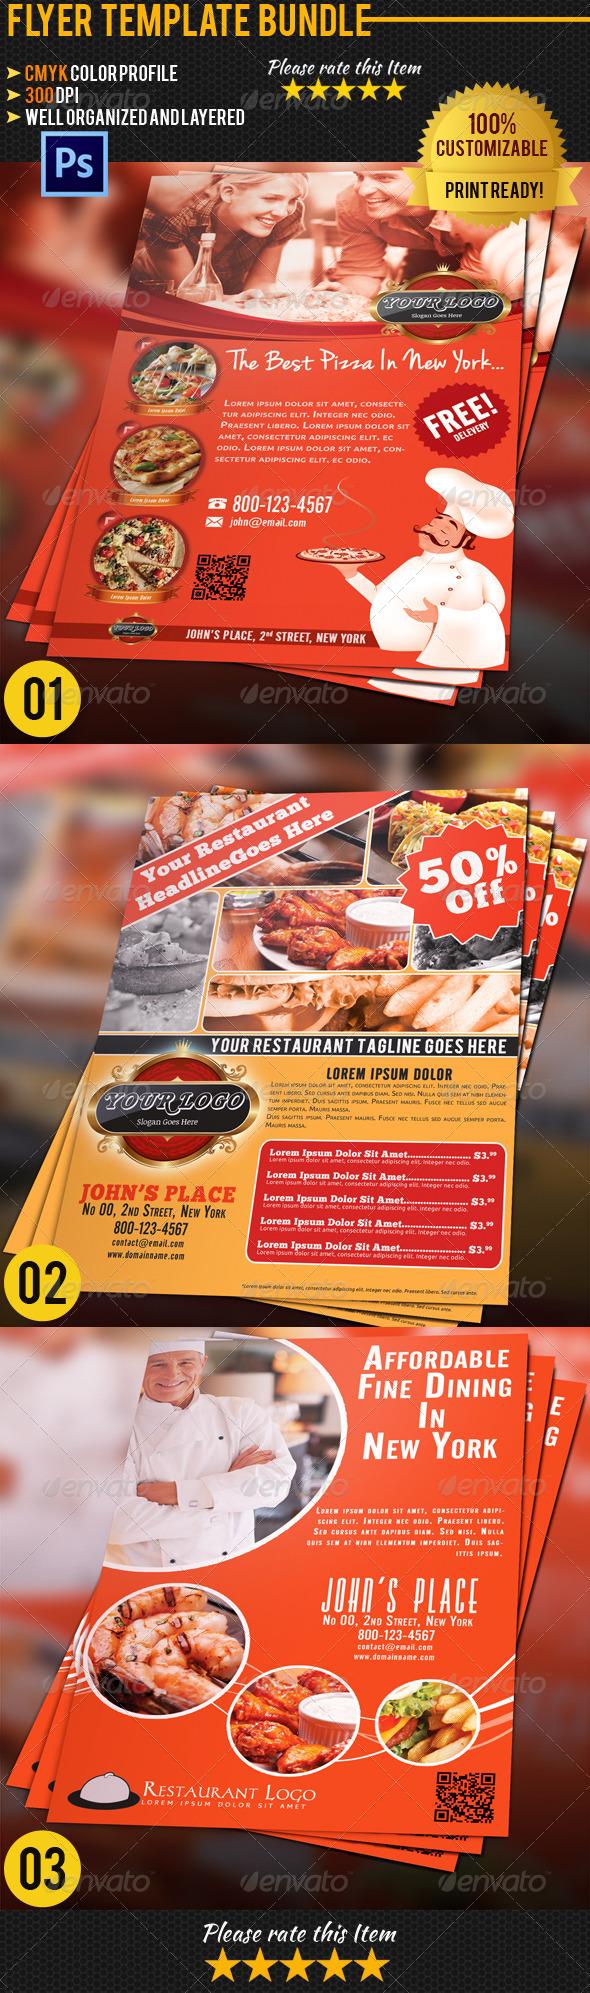 GraphicRiver Restaurant Flyer Bundle 01 4707004